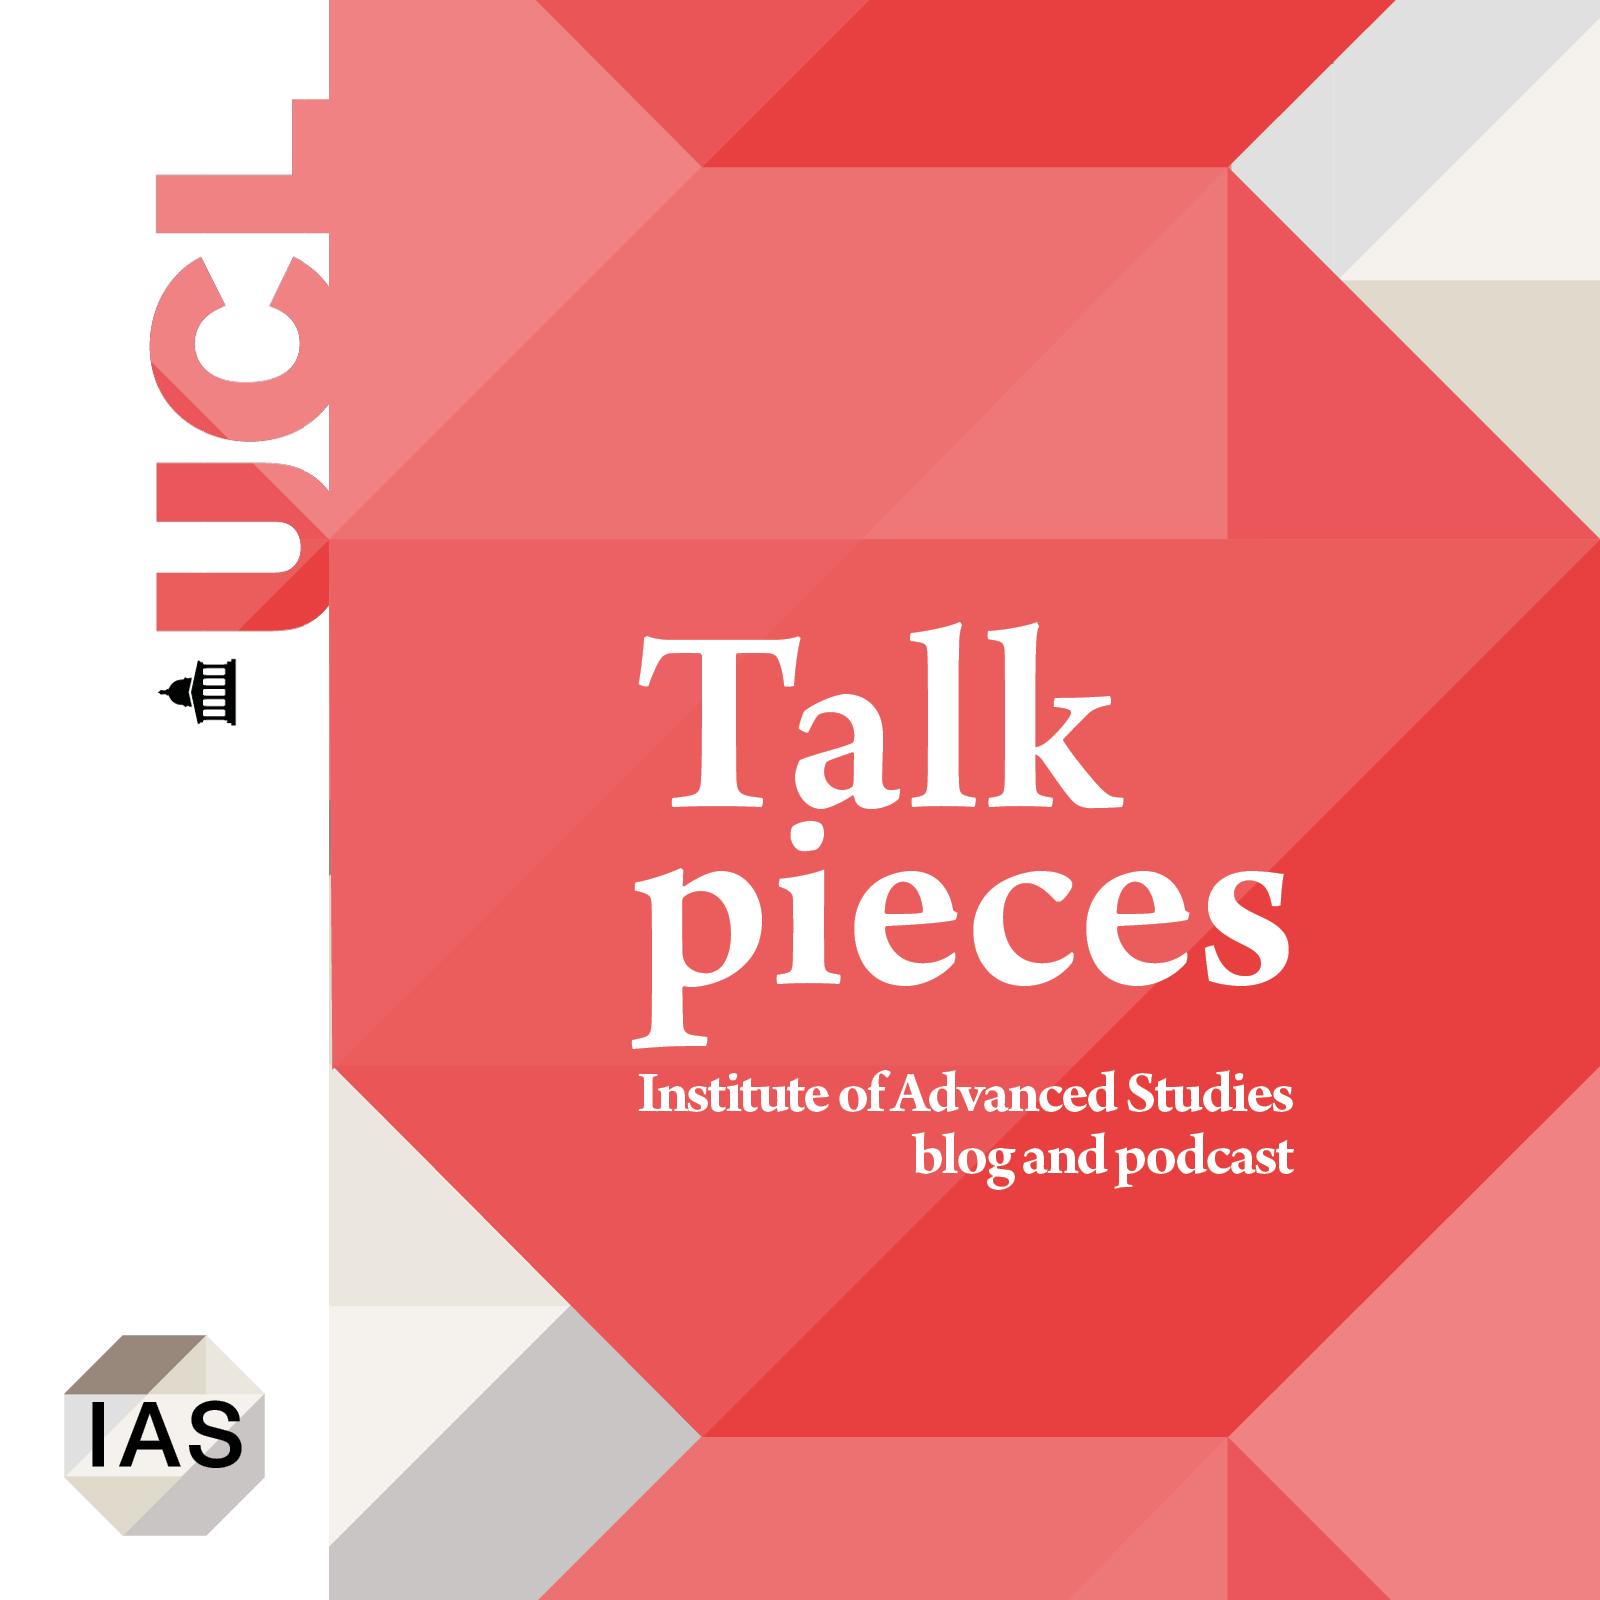 logo talk pieces